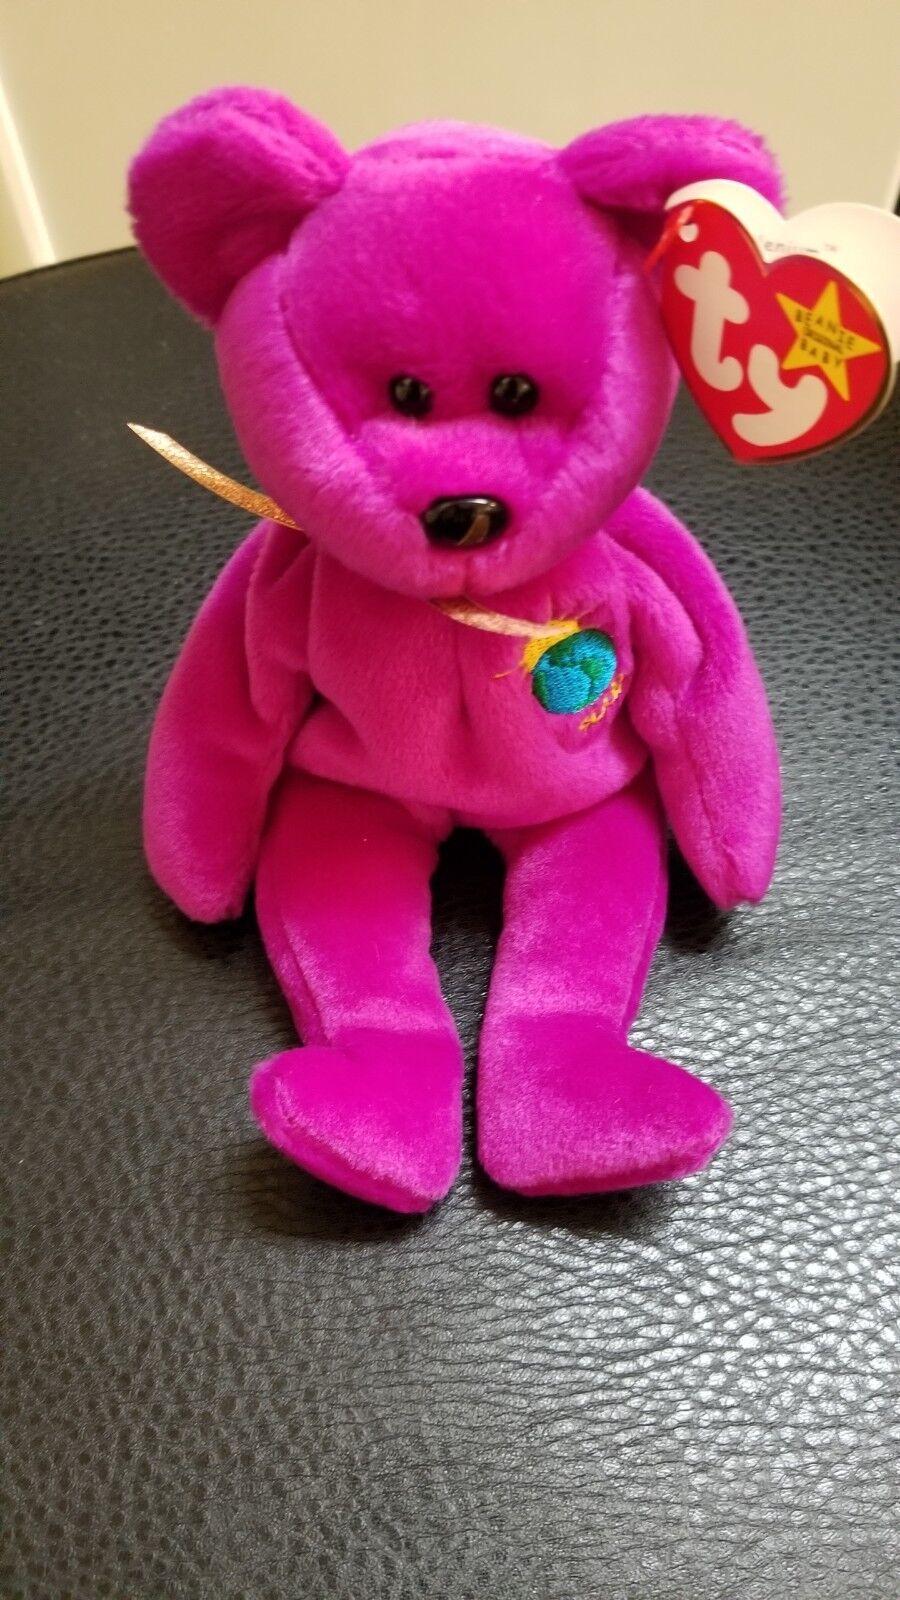 Authenticated Rare 1991 TY Beanie Baby - MILLENNIUM the Bear w errors